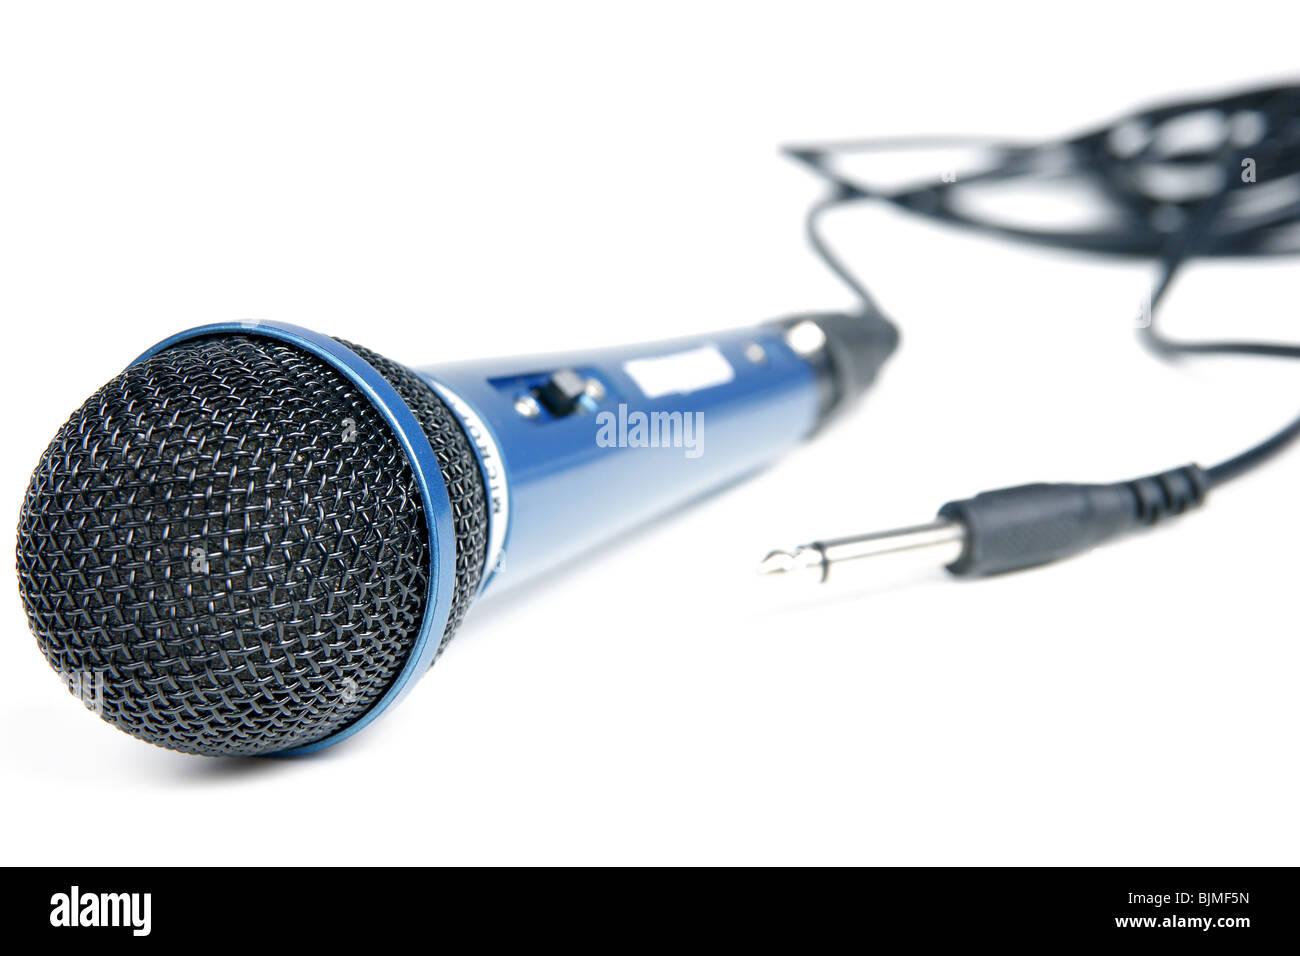 Big Blue micro pour karaoké miusic close-up Photo Stock